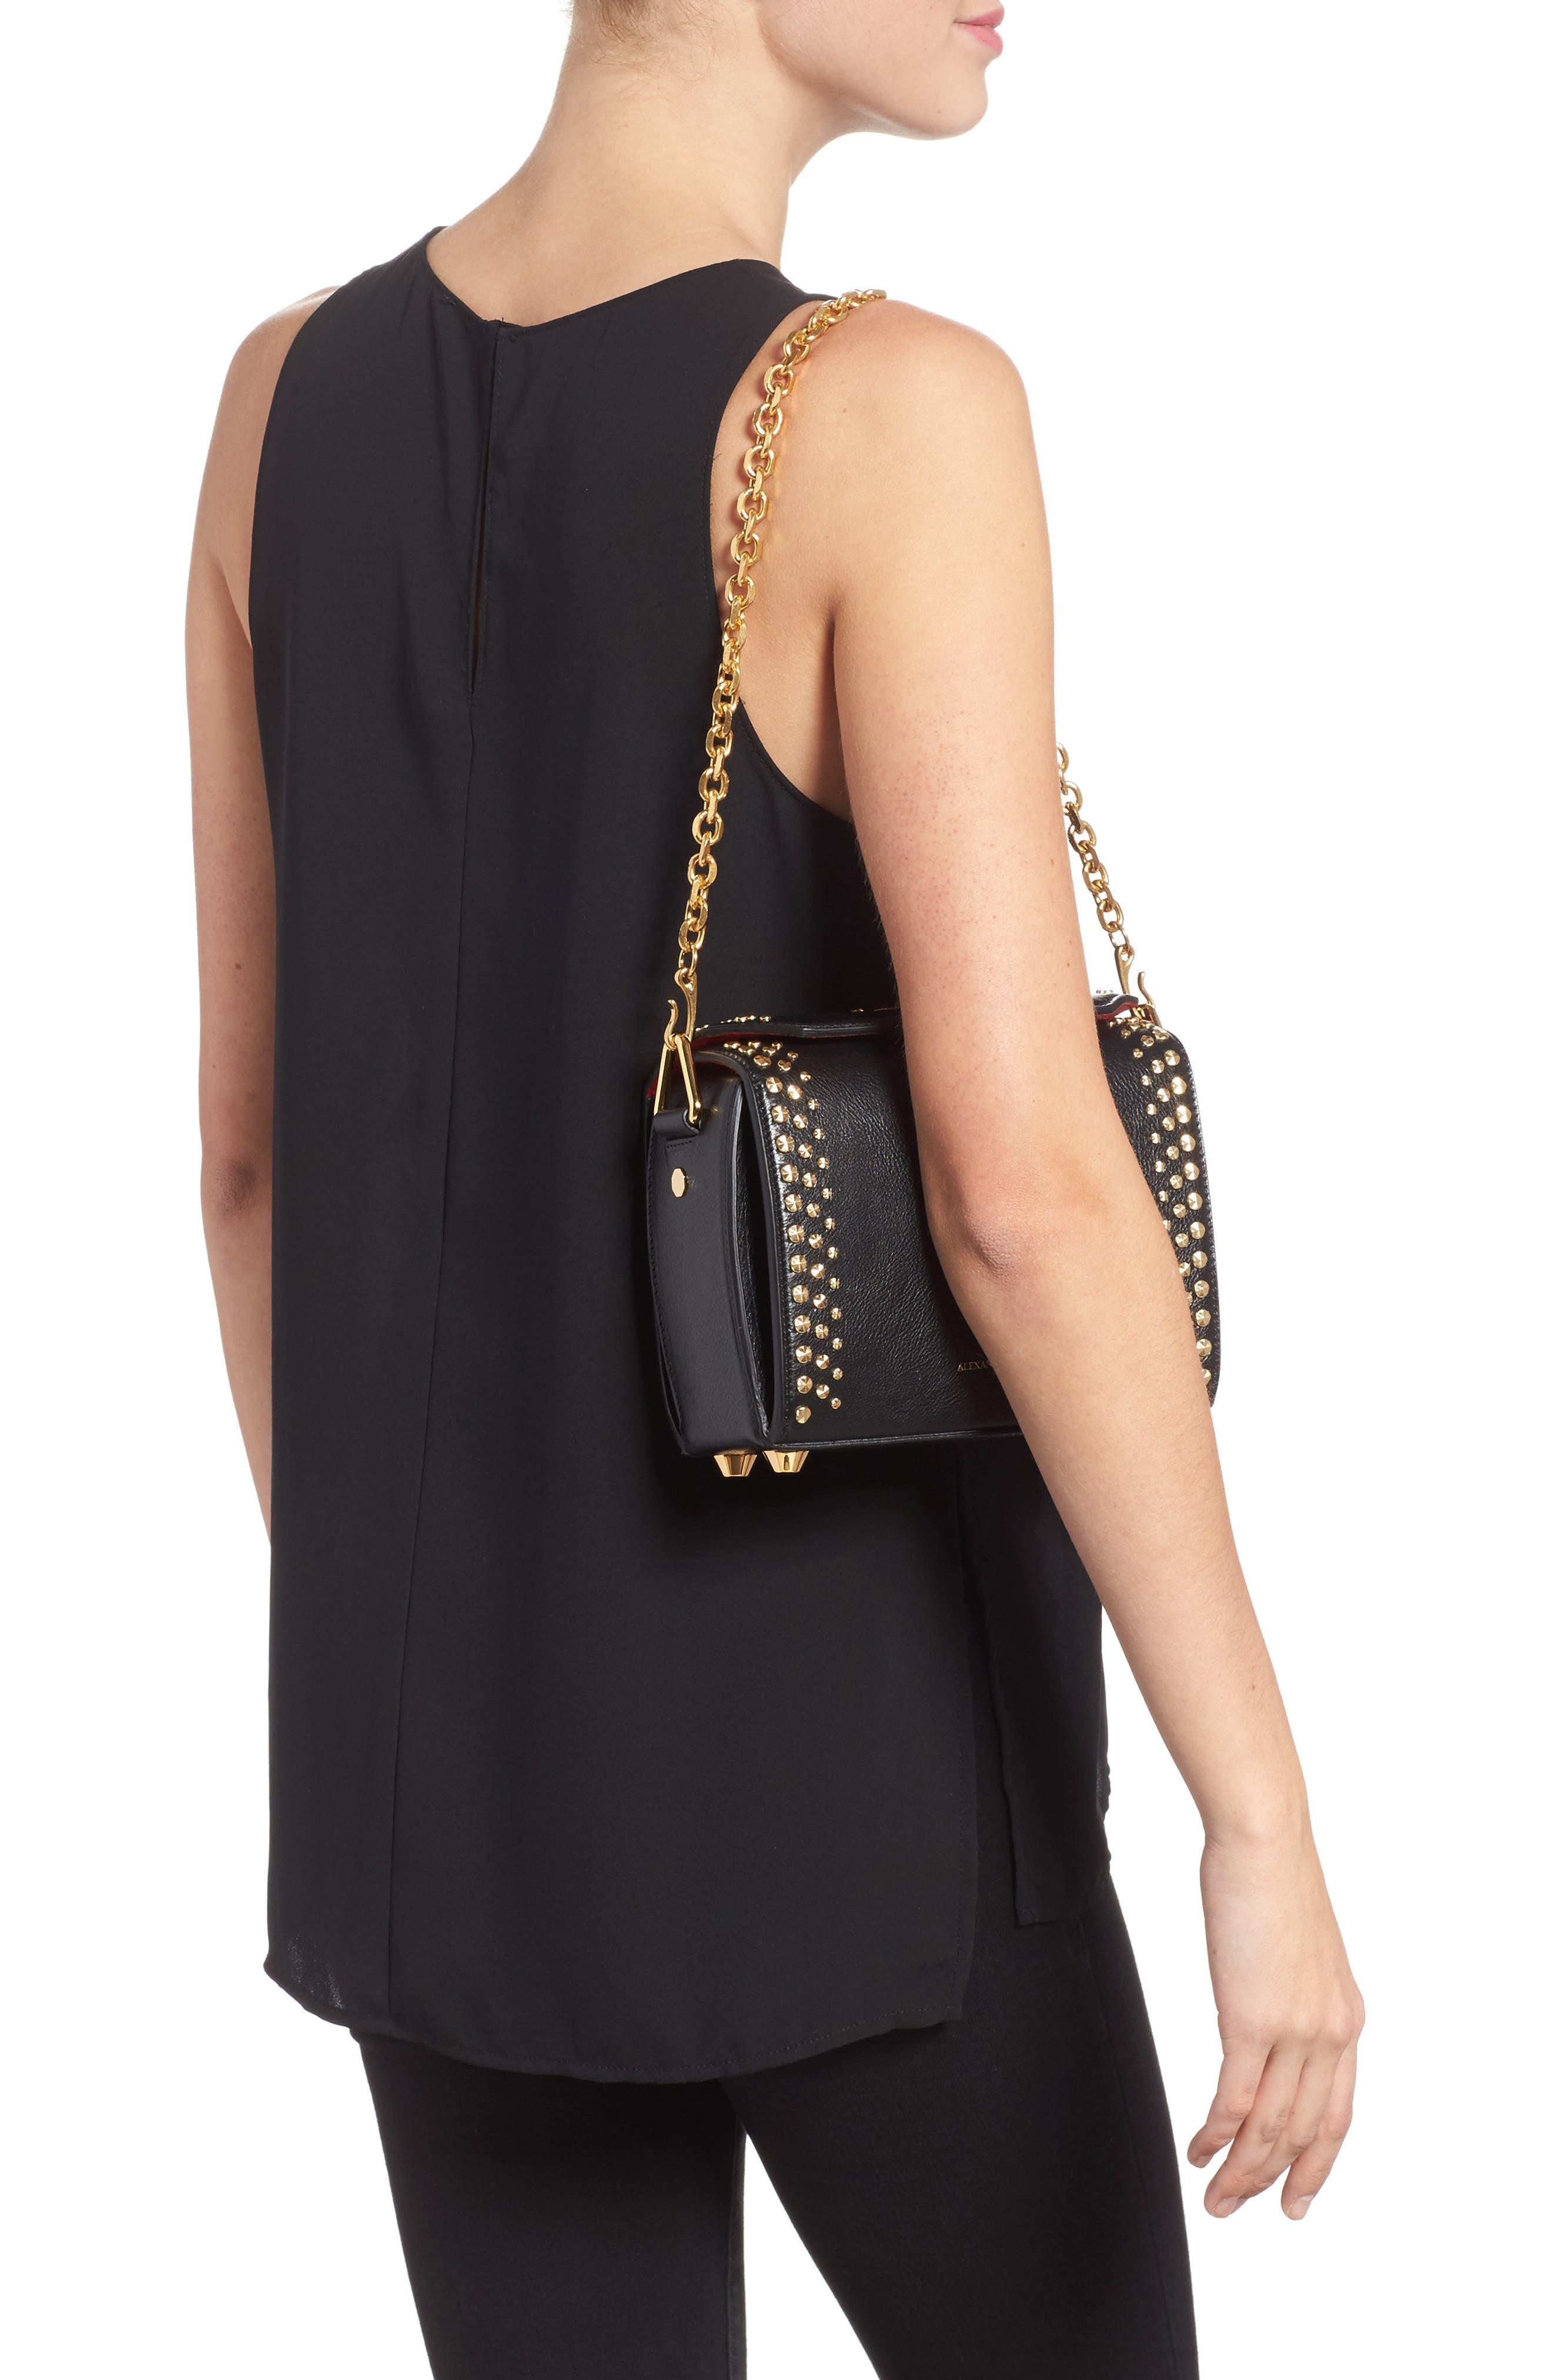 Box Bag 19 Studded Leather Bag,                             Alternate thumbnail 2, color,                             BLACK